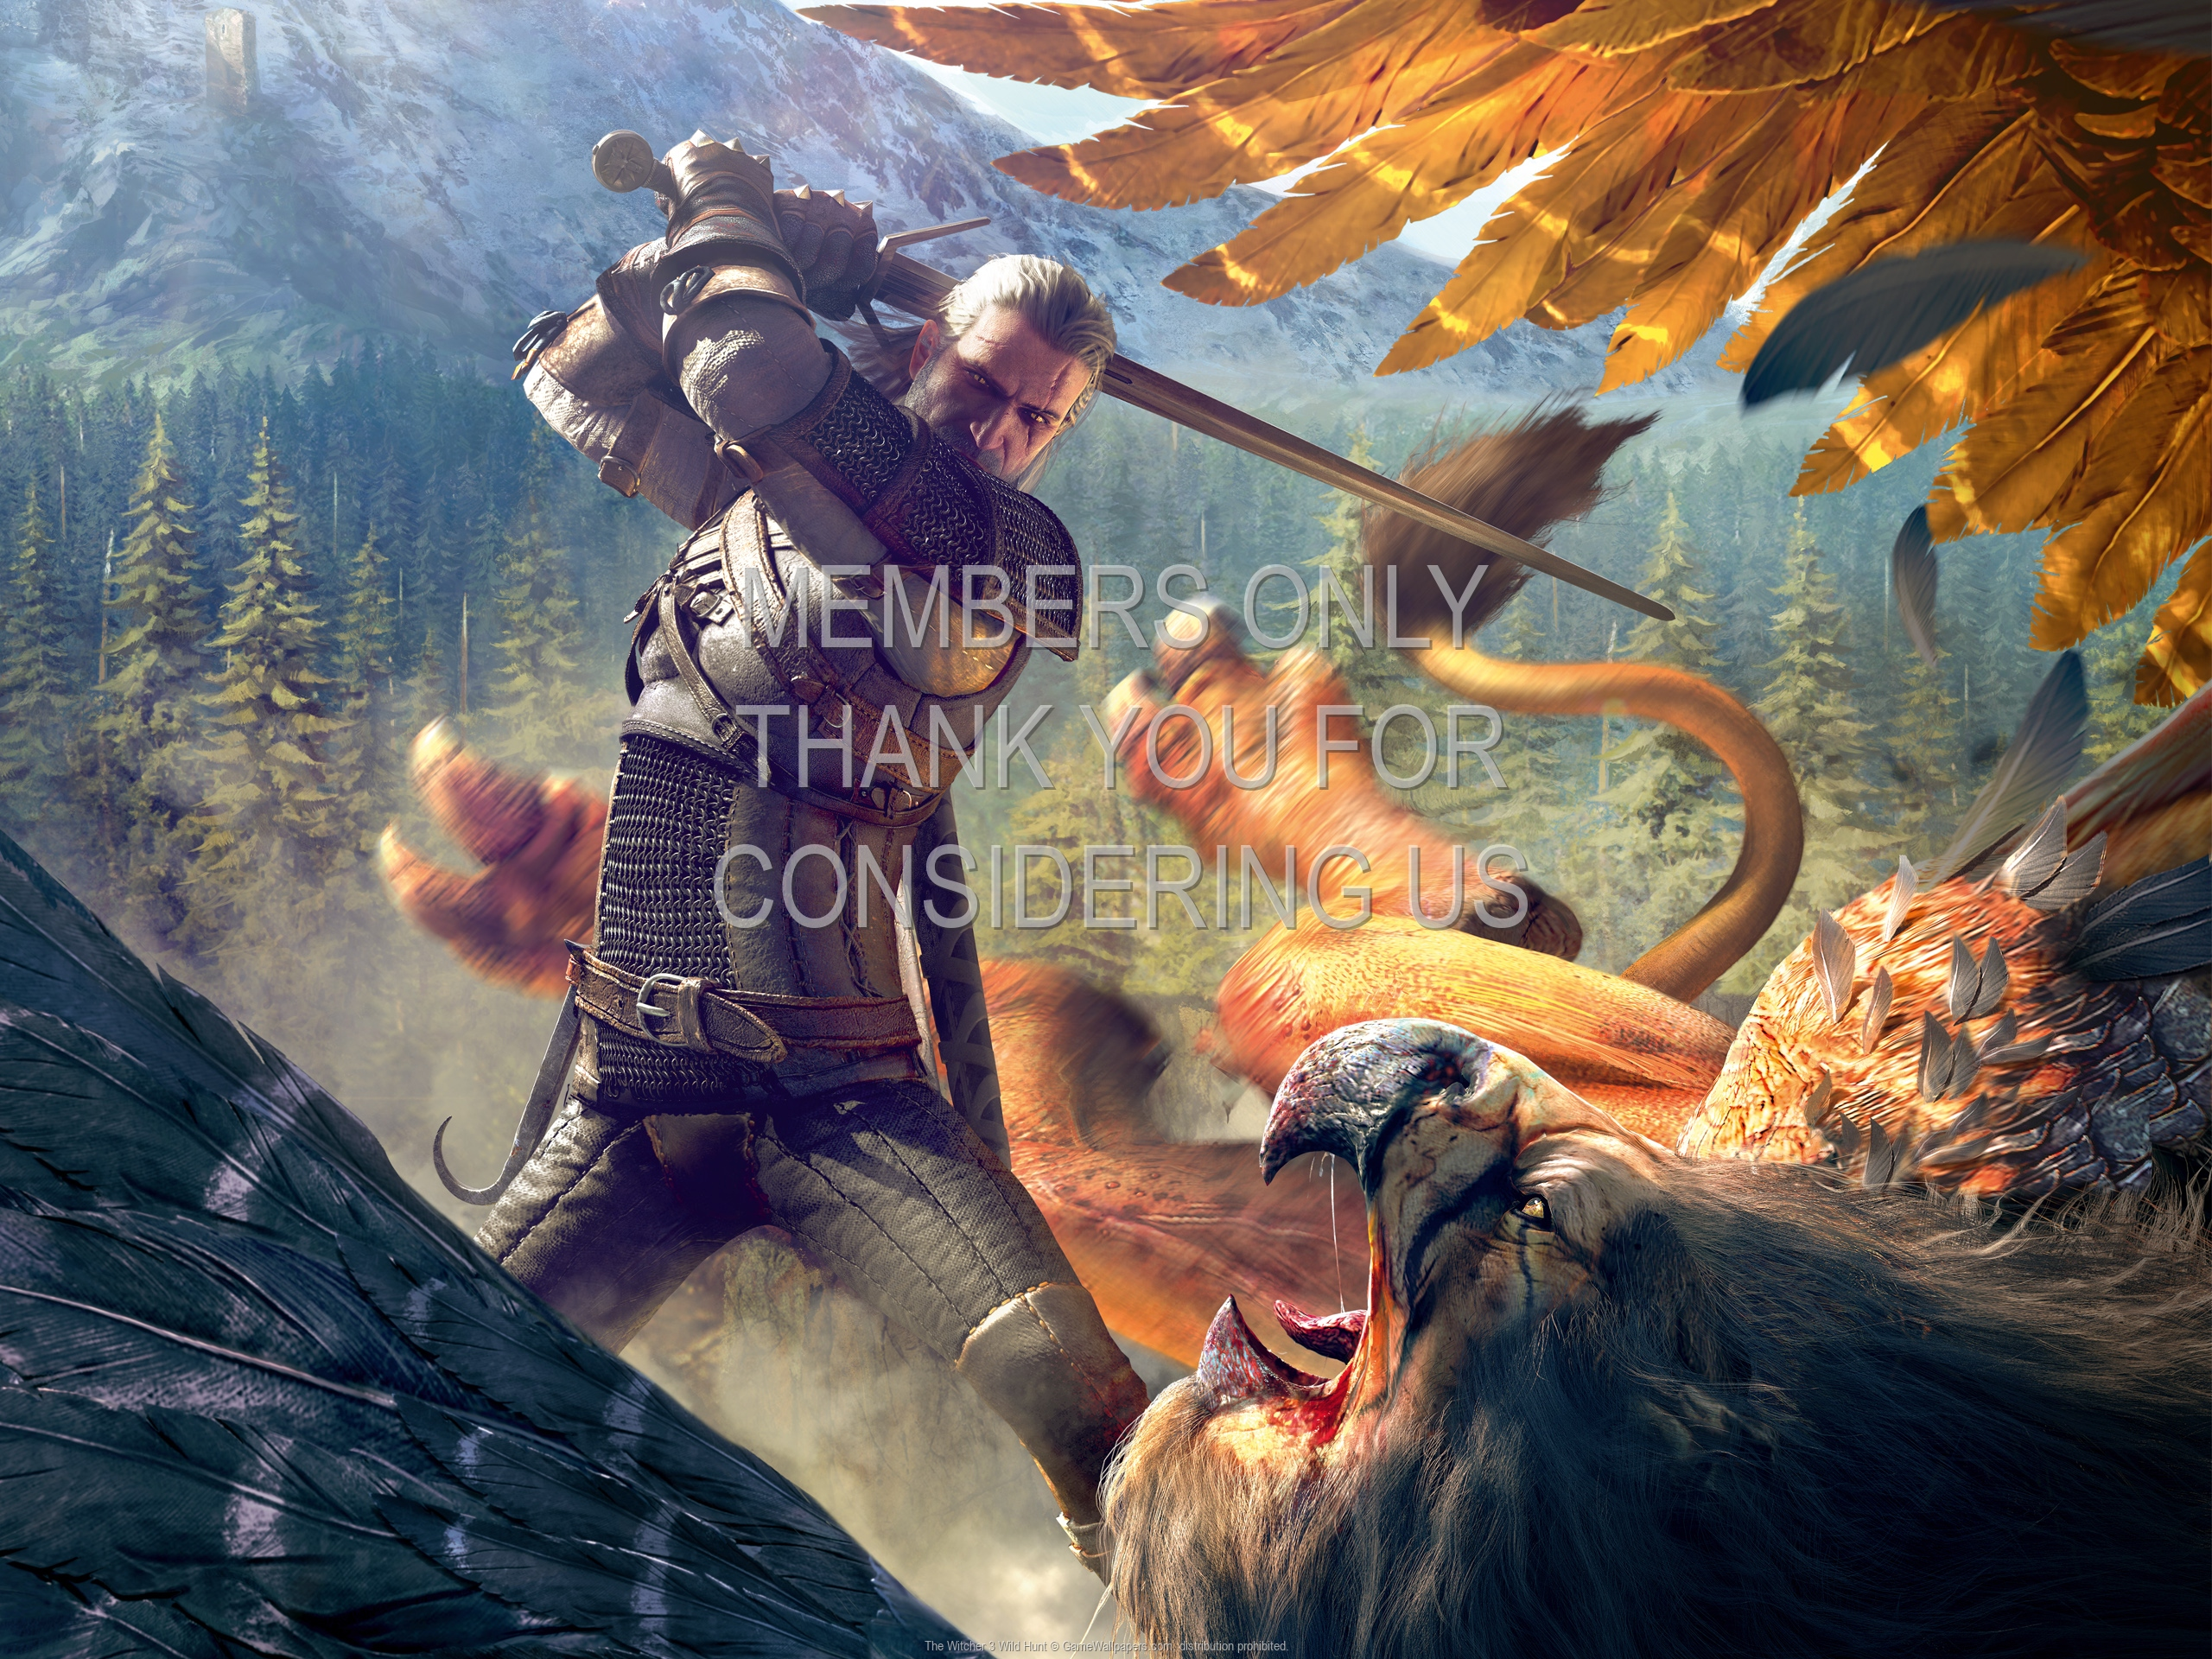 The Witcher 3: Wild Hunt 1920x1080 Mobiele achtergrond 29